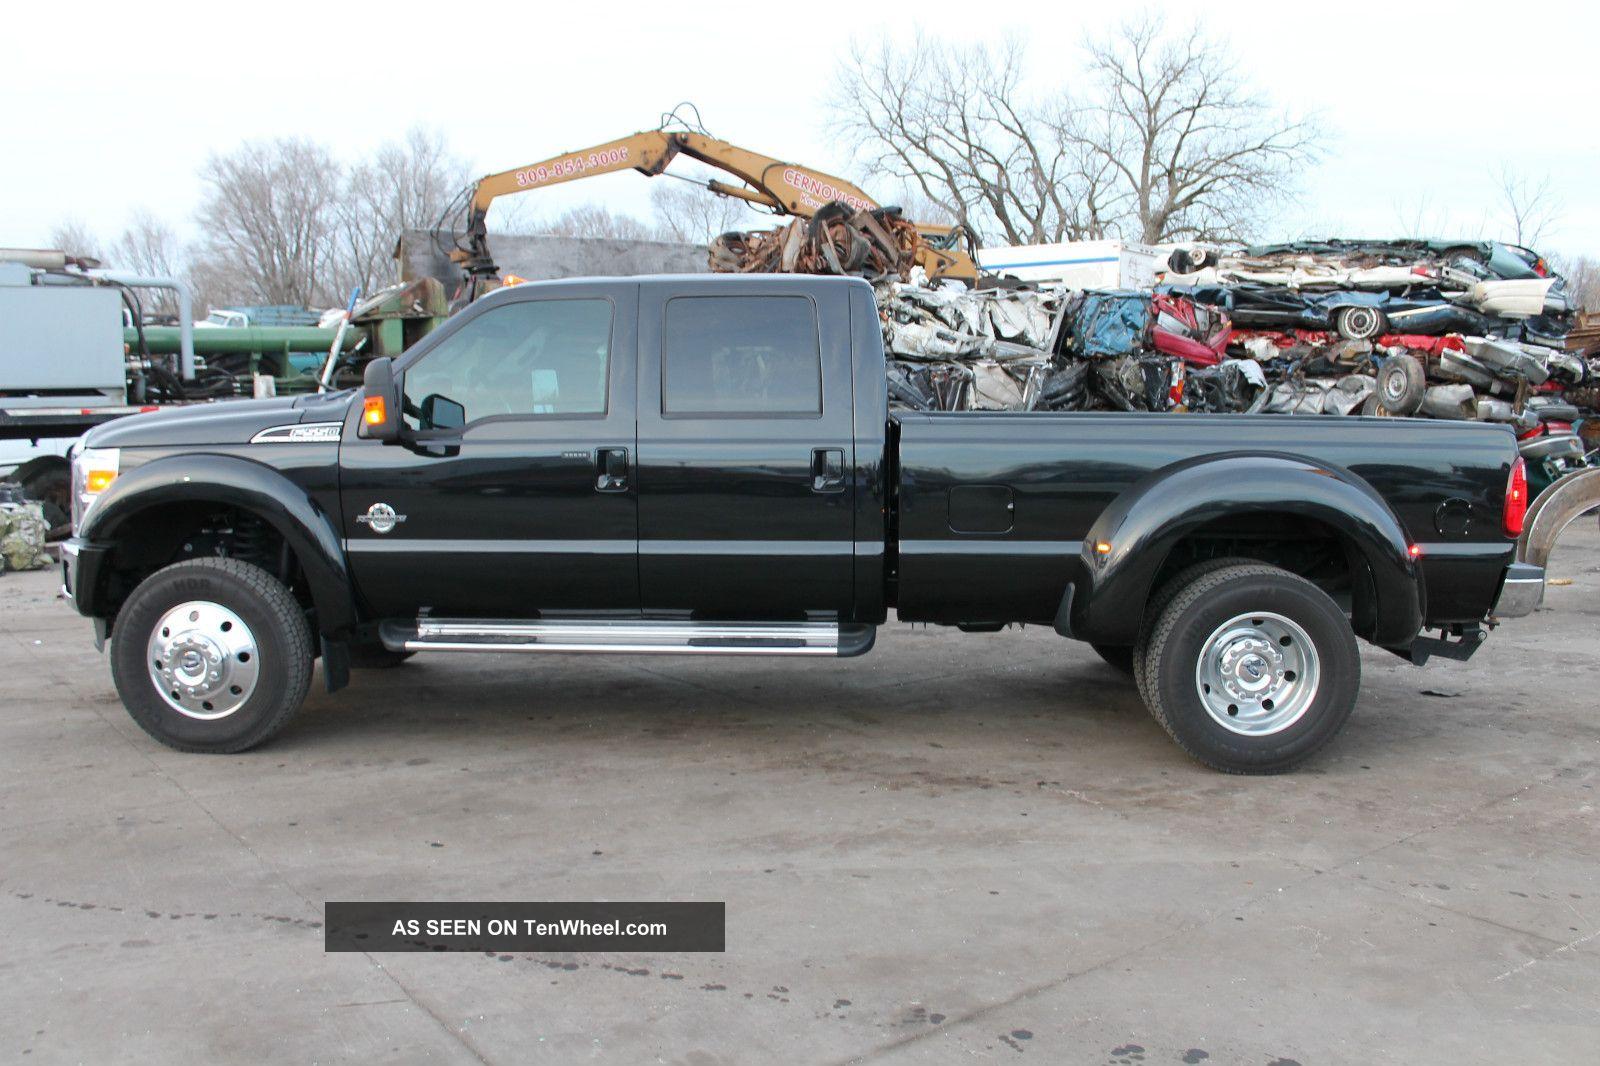 F550 Truck Specs Ford F550 Truck Specs F 550 Truck Specs # | 2020 Car ...